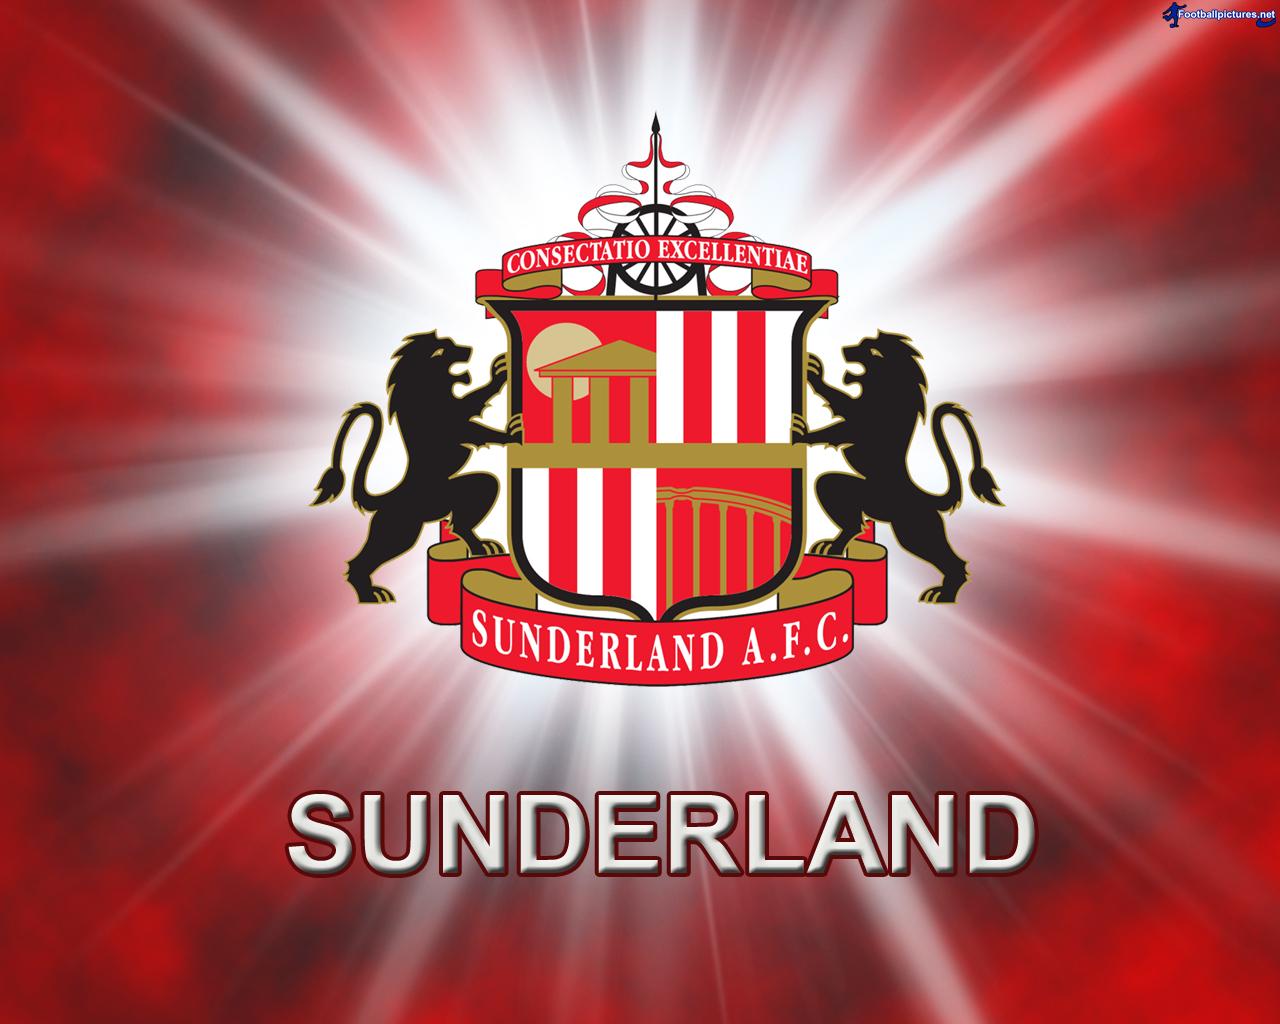 96] Sunderland Wallpapers on WallpaperSafari 1280x1024